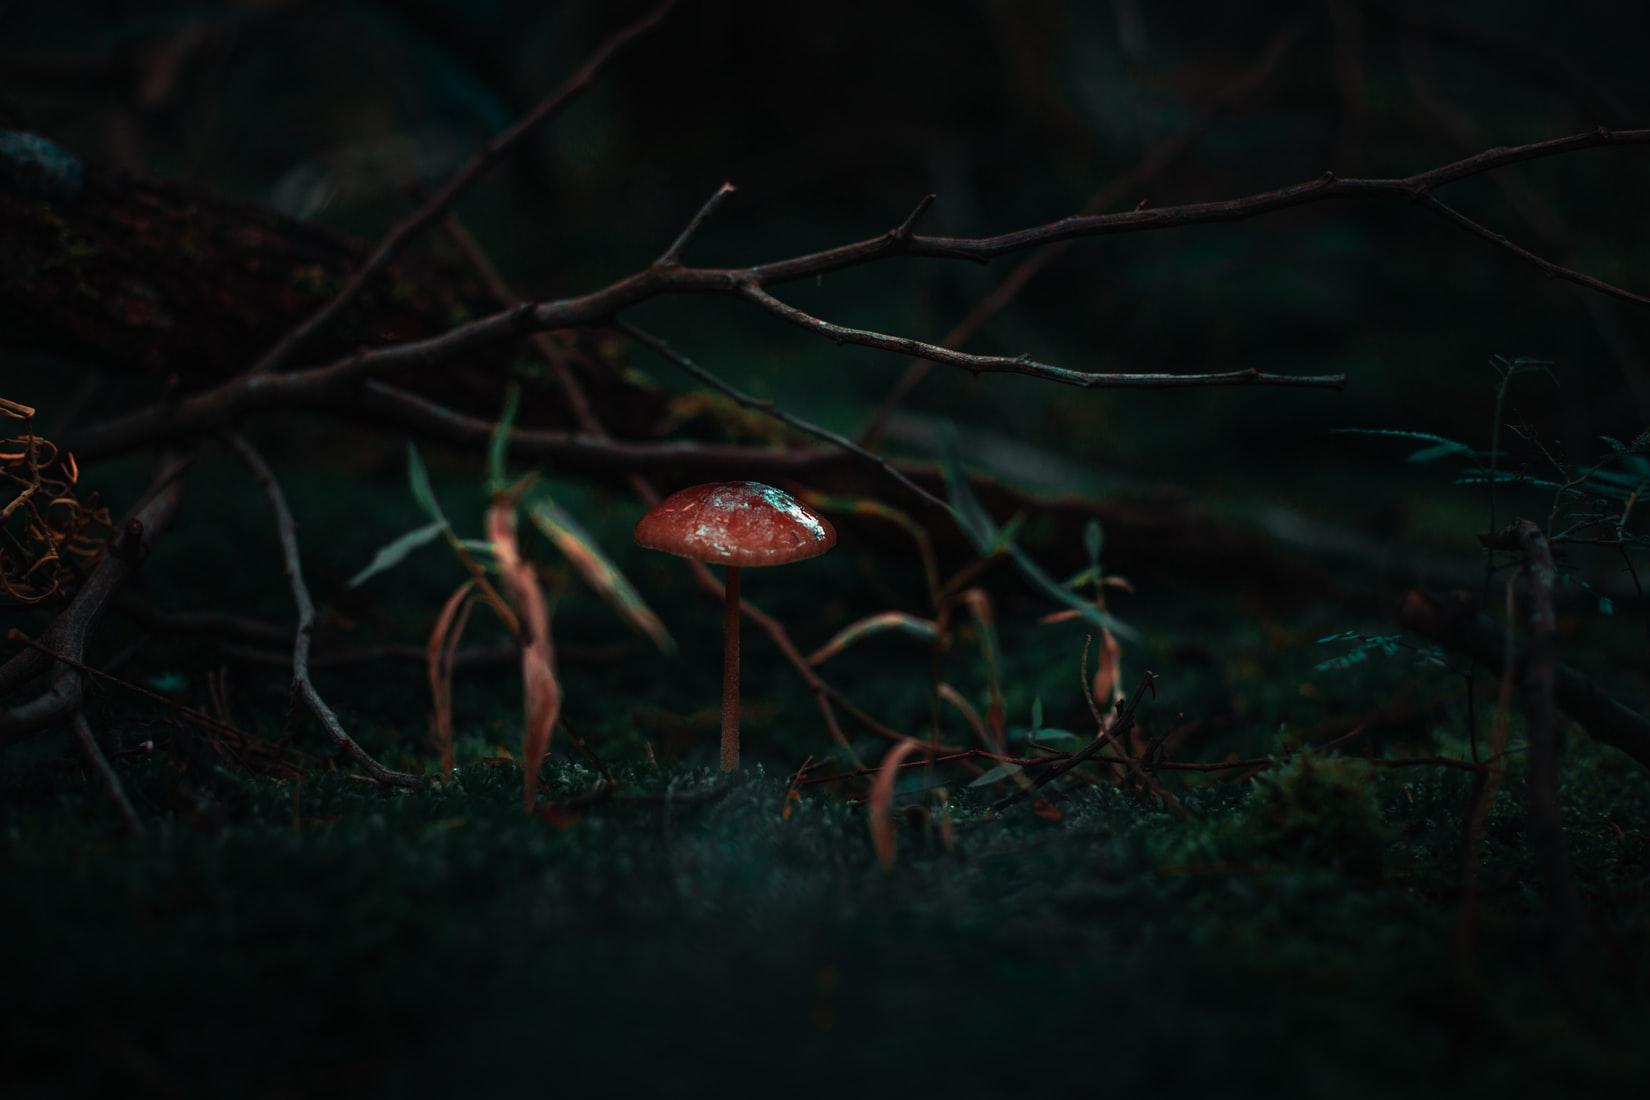 Red mushroom beside grass and sticks